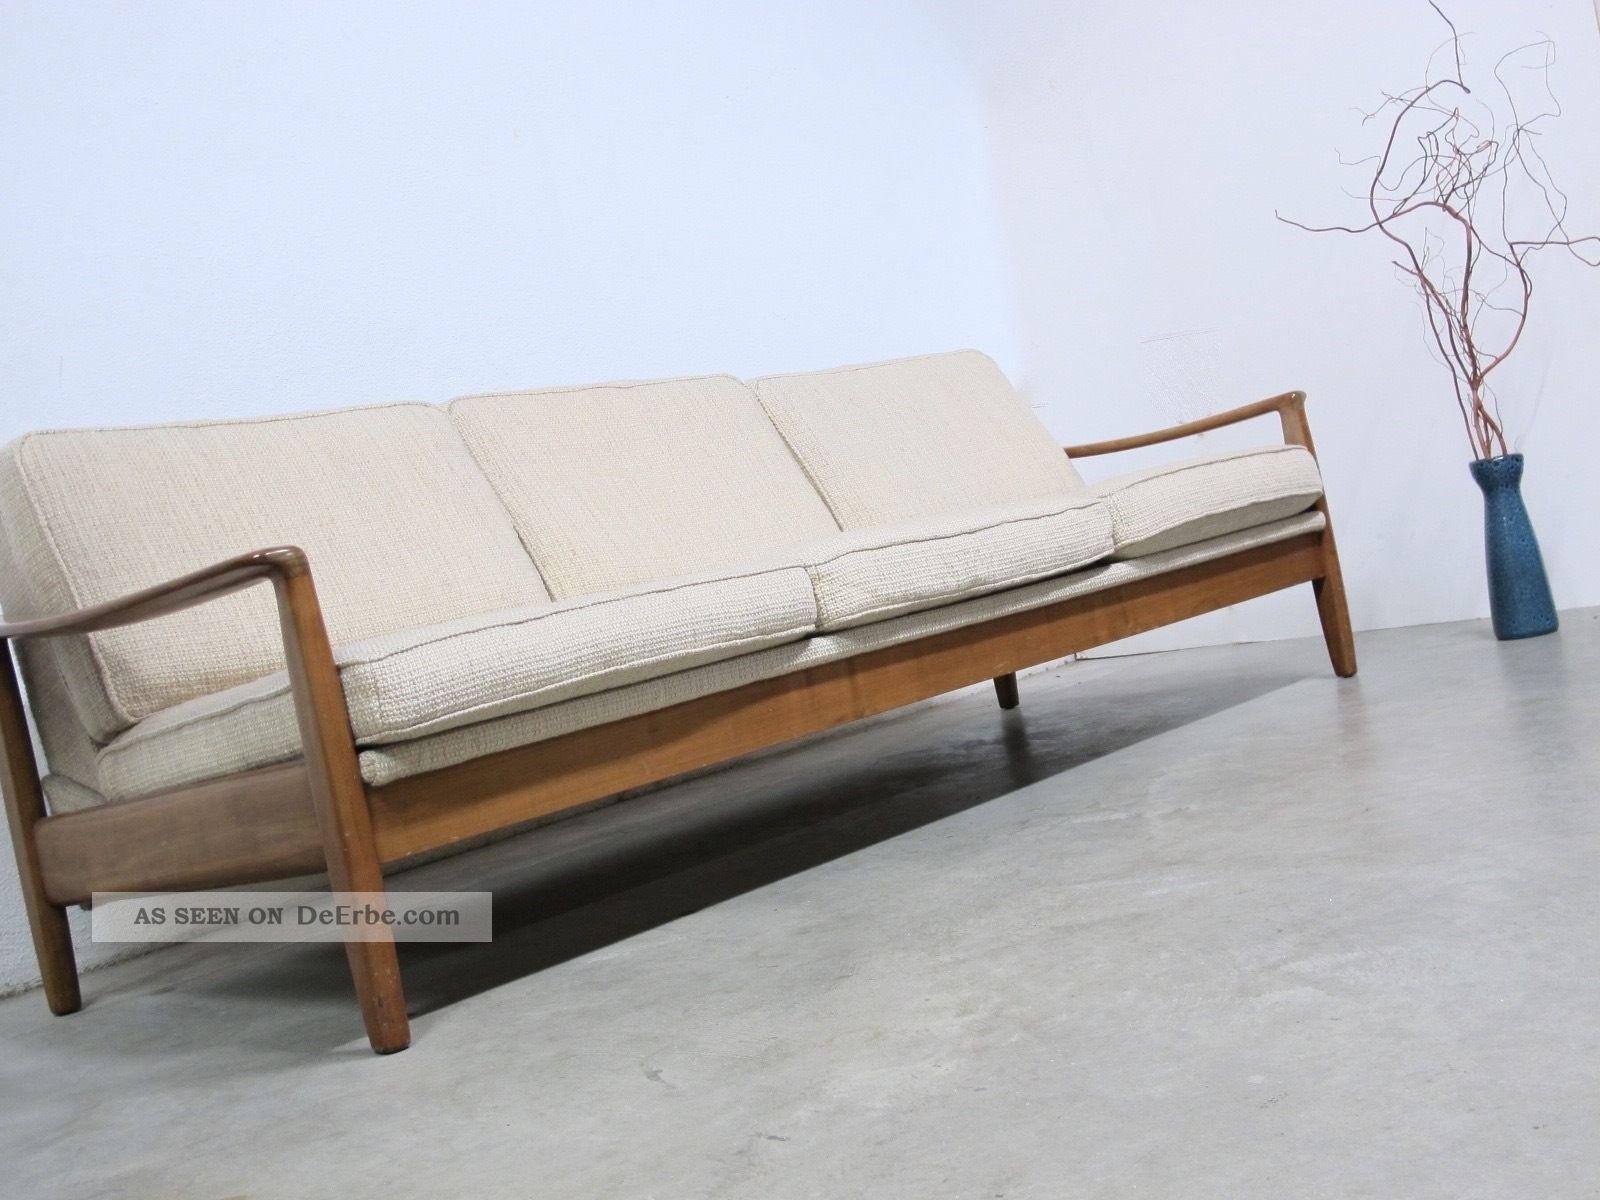 50s Daybed Midcentury Lounge Sofa Klappsofa Danish Style 1960-1969 Bild